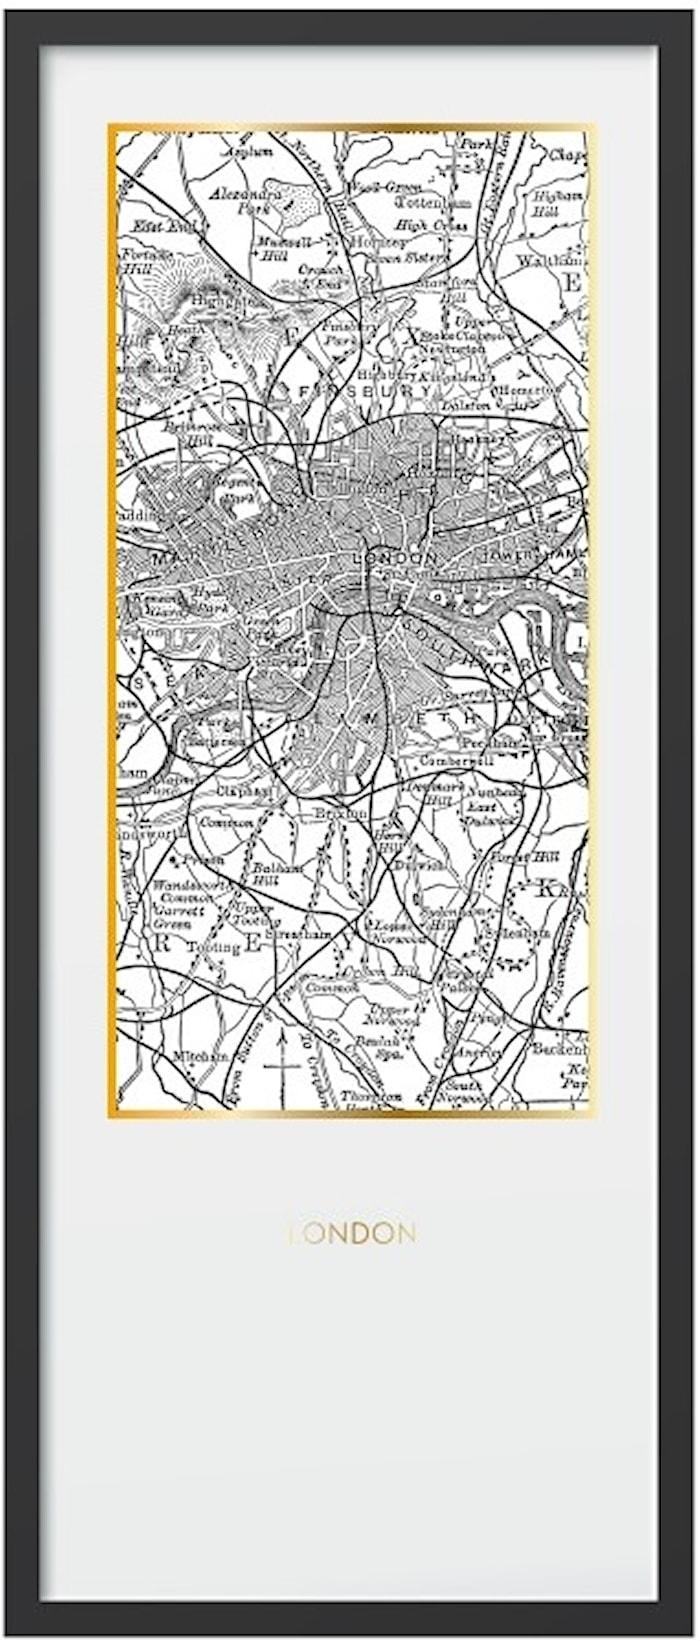 Framed print London – 50x120